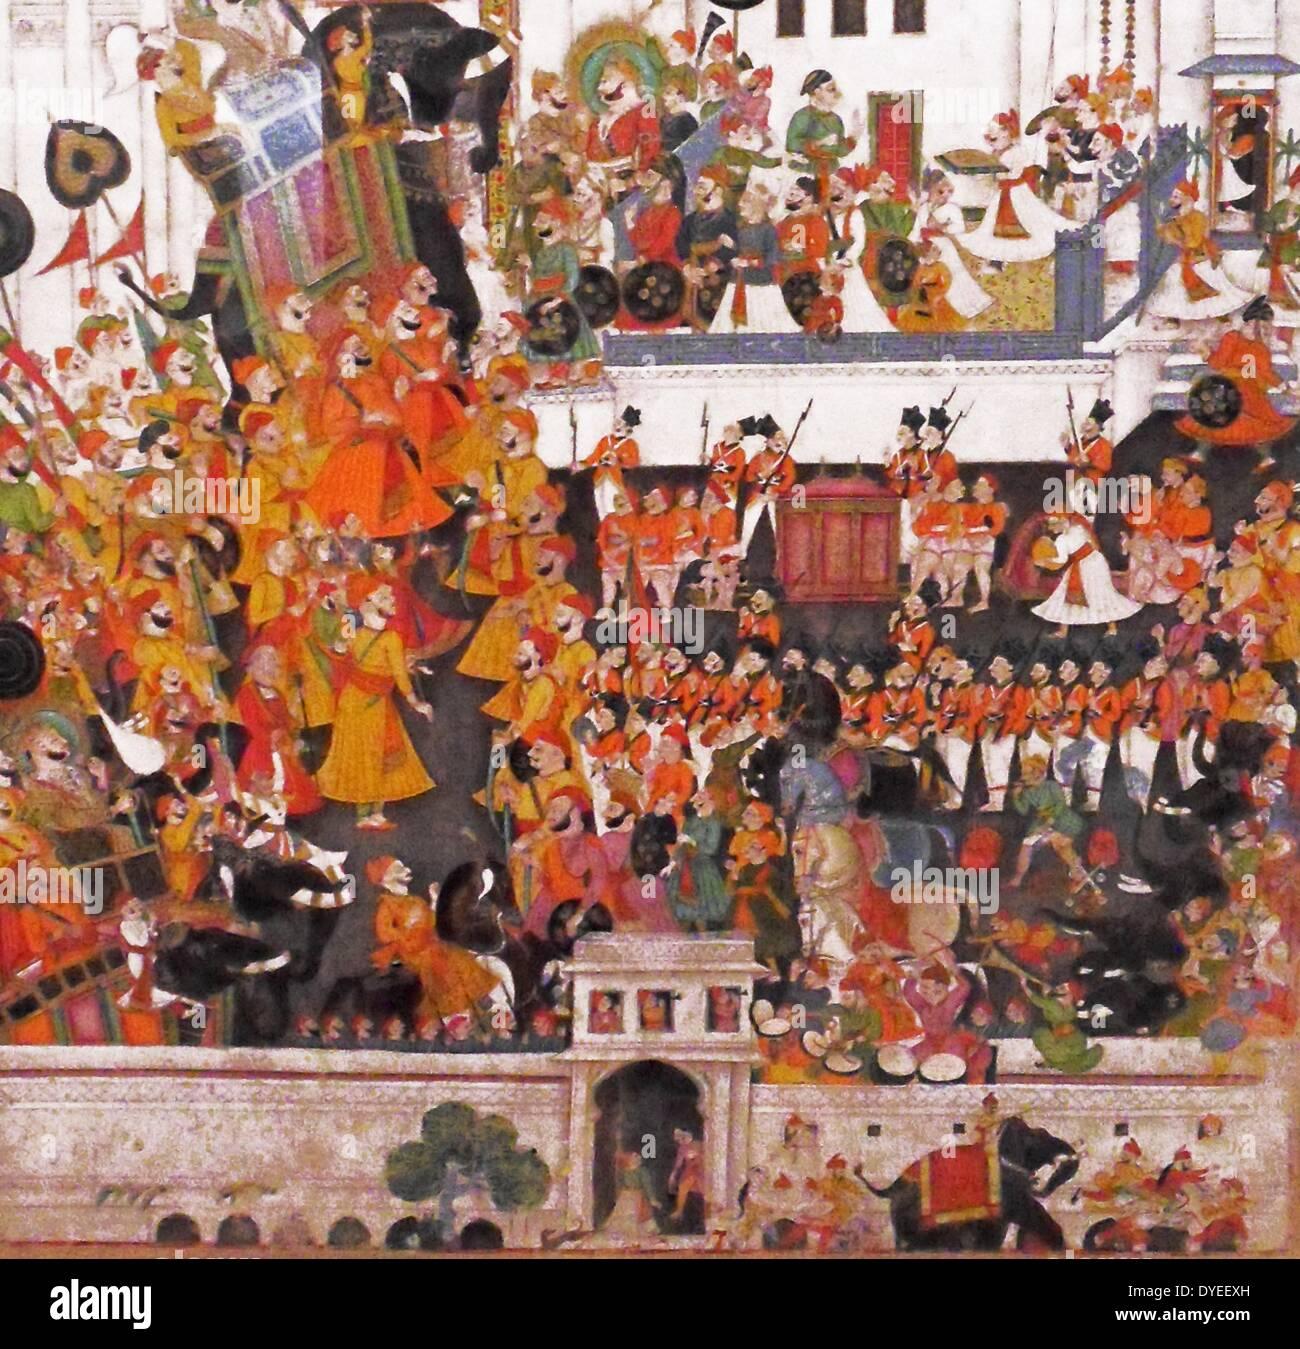 Durbar of Akbar Shah II 1820 A.D. - Stock Image